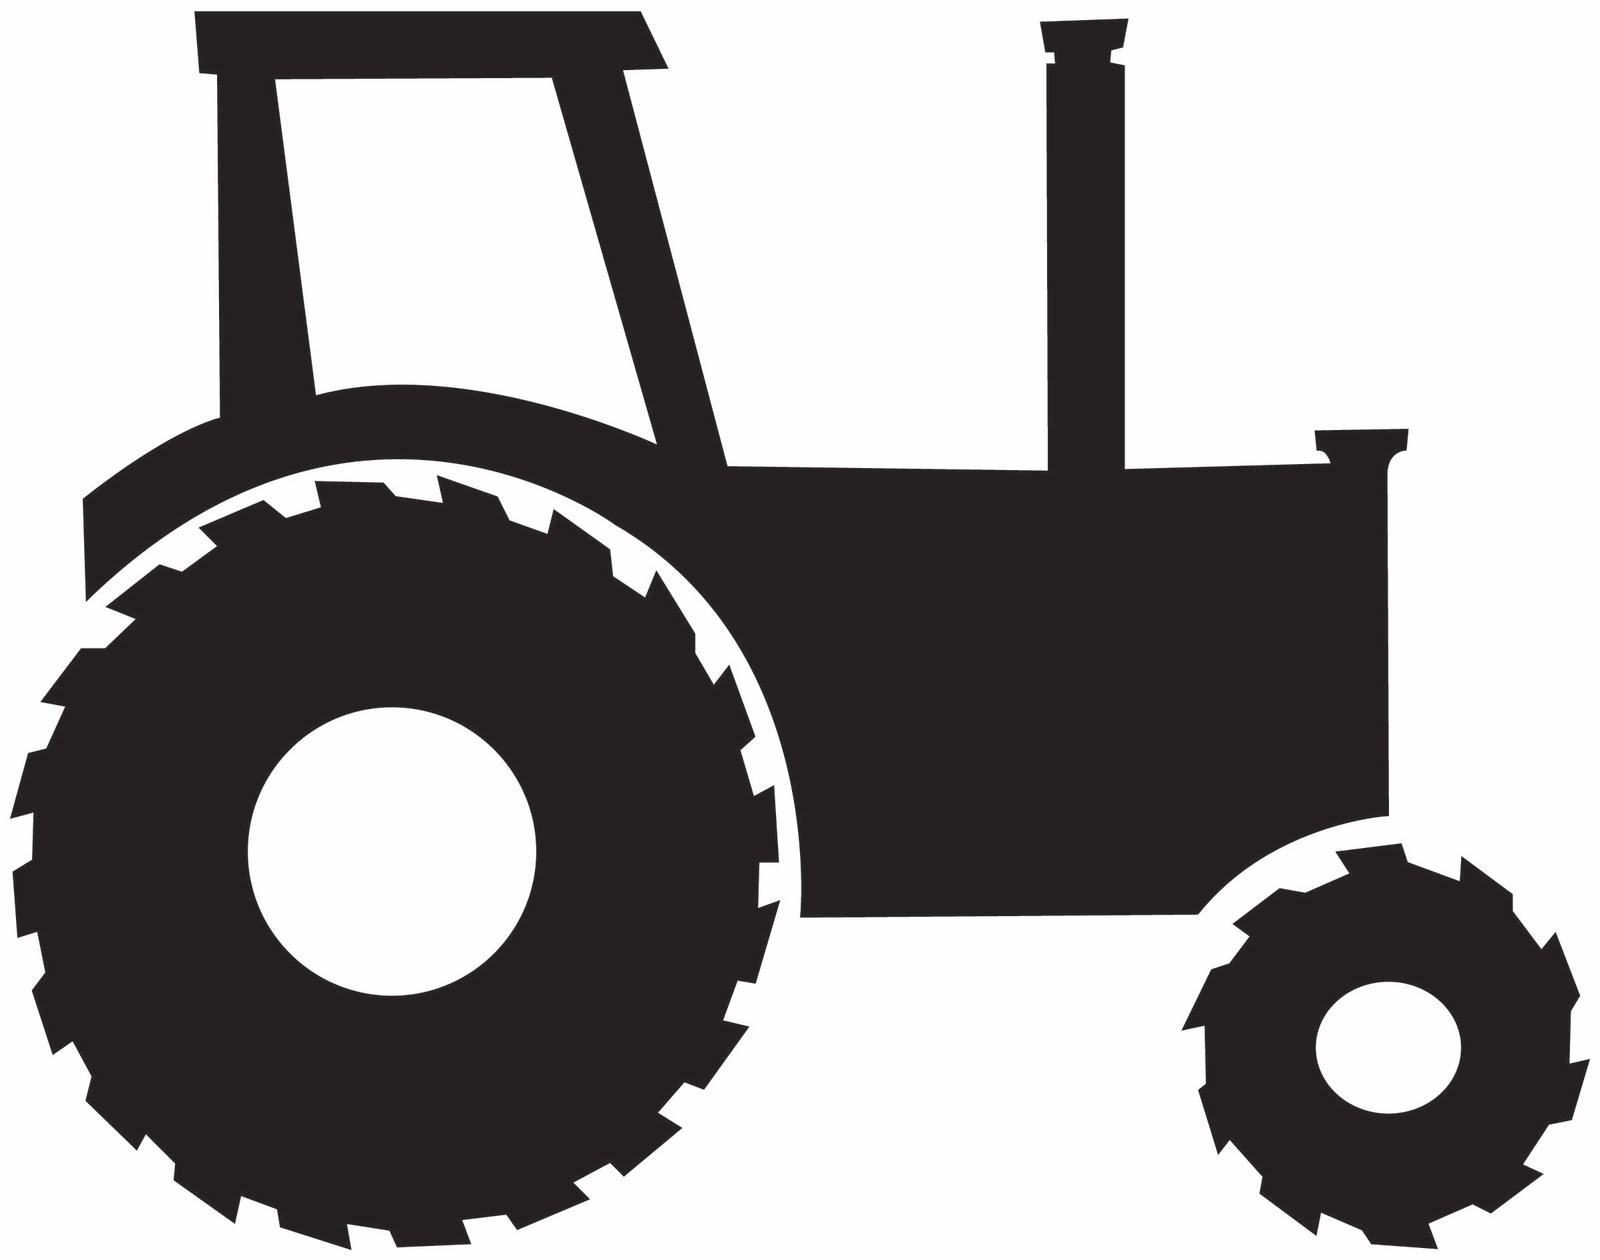 Fintans Blog Tractor-Fintans Blog Tractor-4